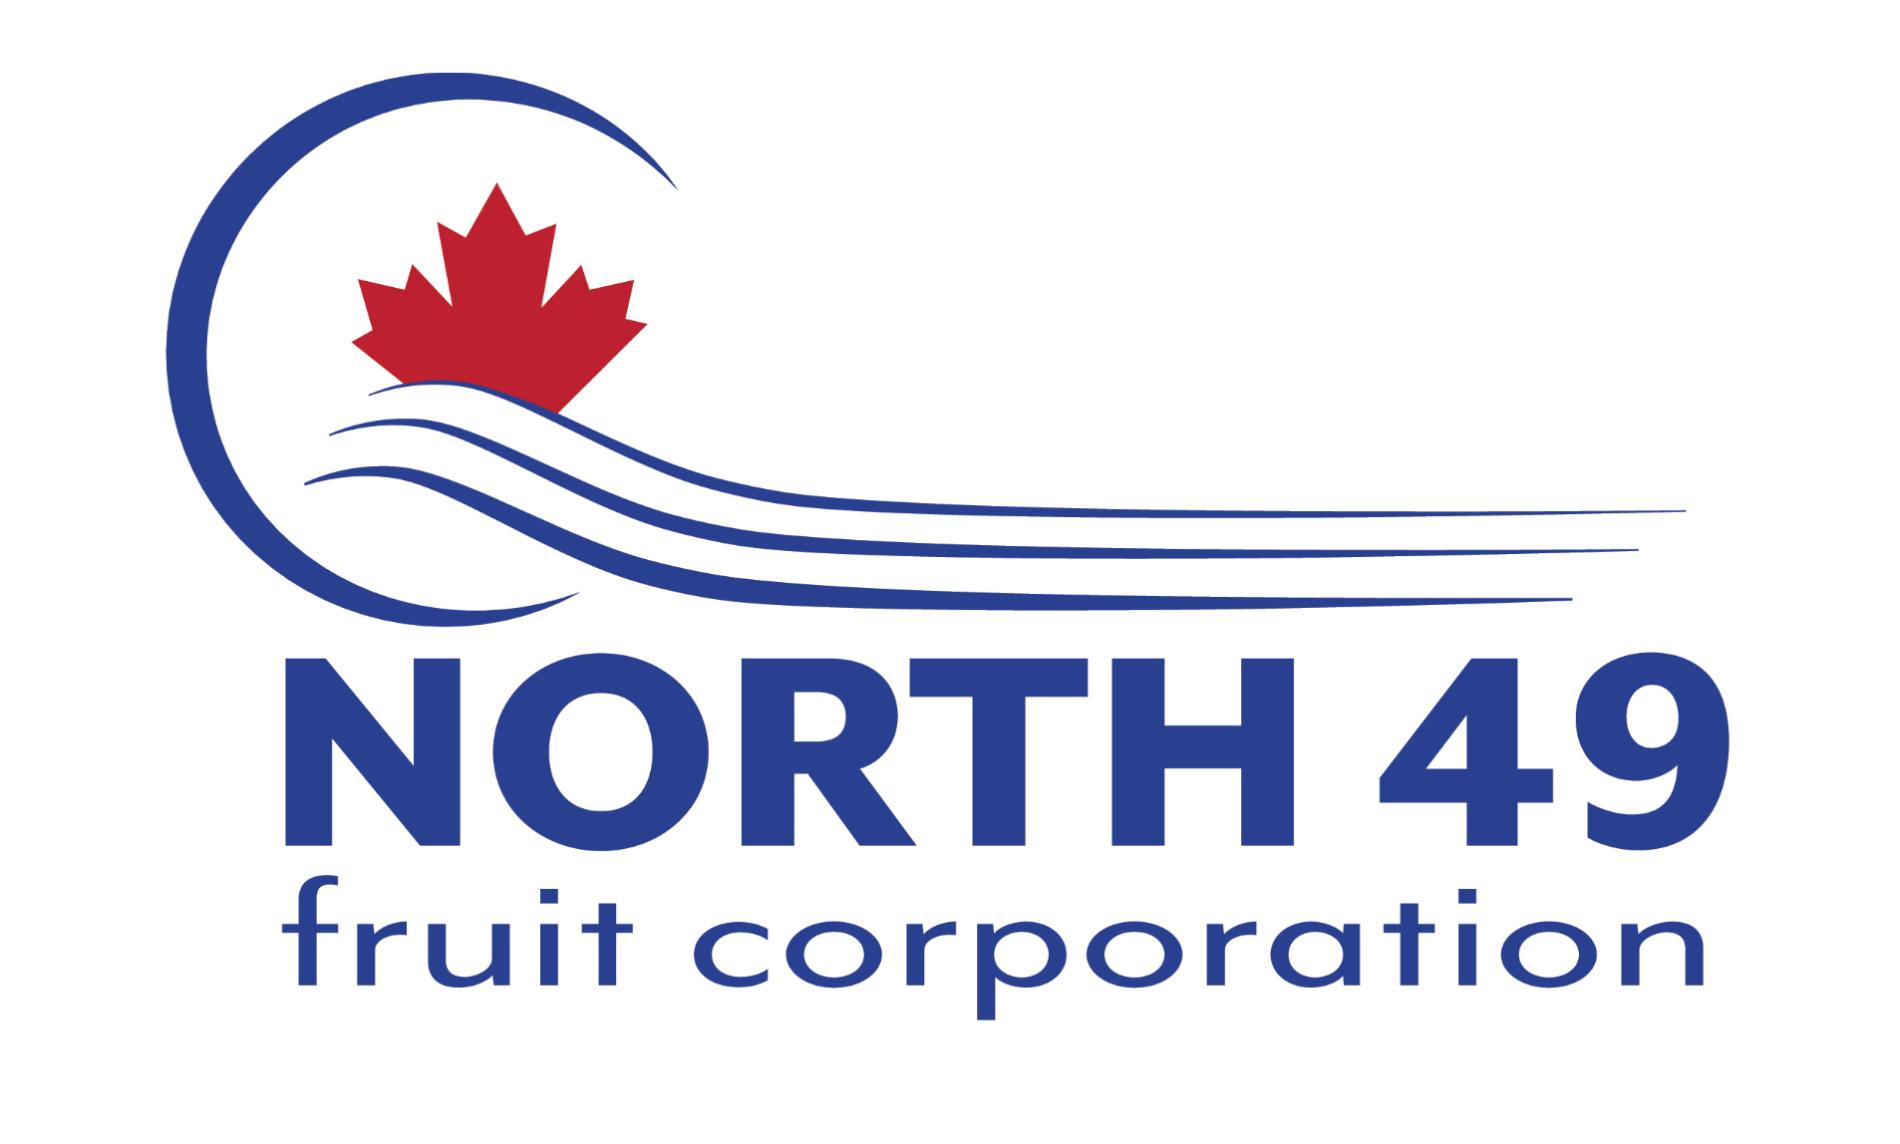 North 49 Fruit Corporation